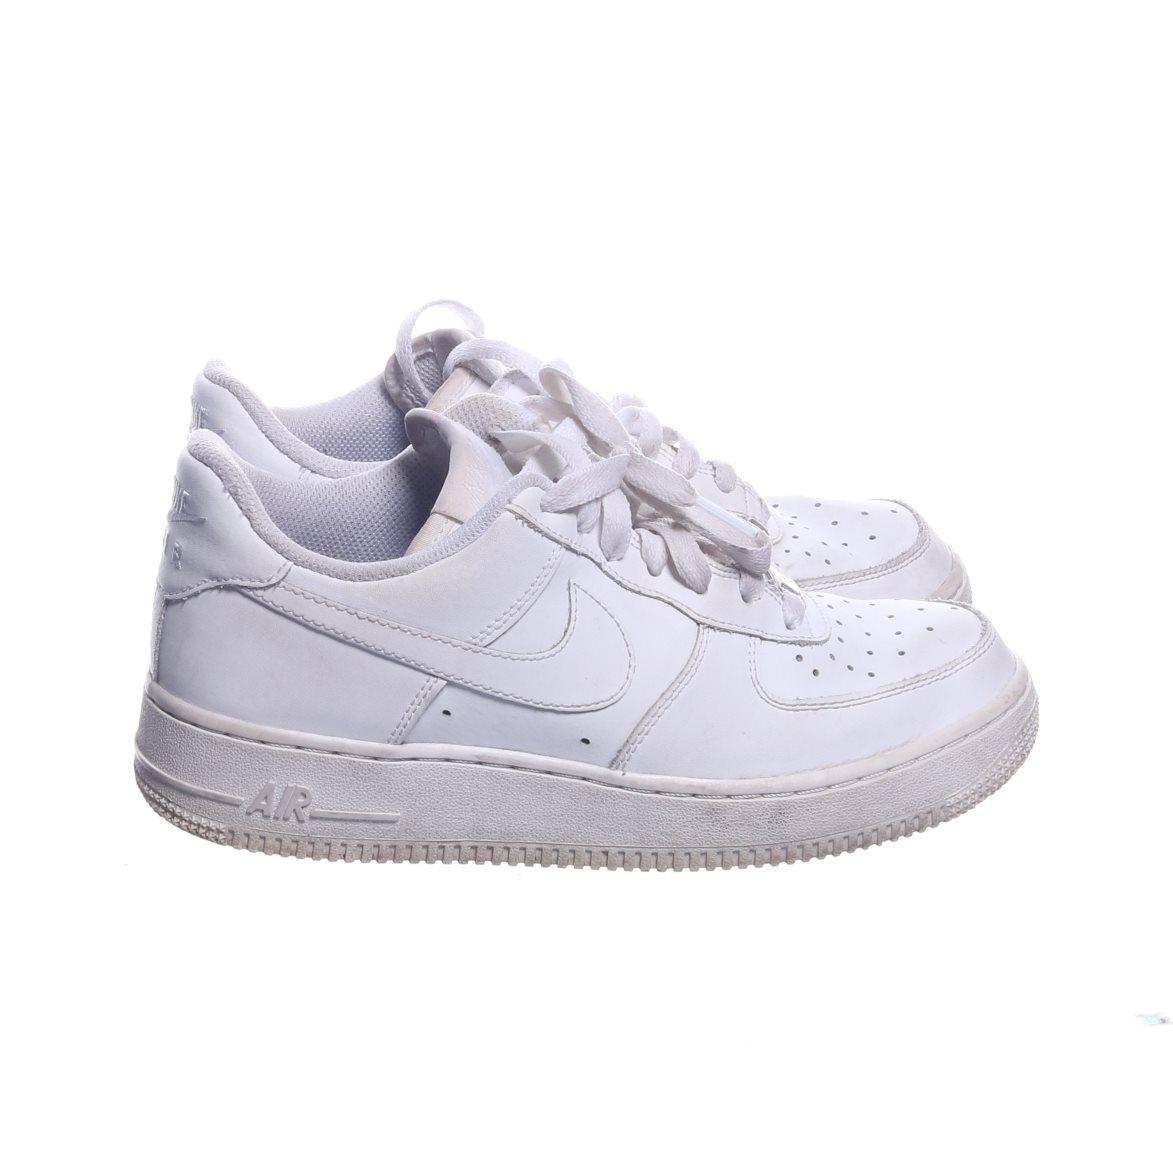 new concept 2fa08 765dd Nike Air Force 1, Sneakers, Strl  38,5, Vit